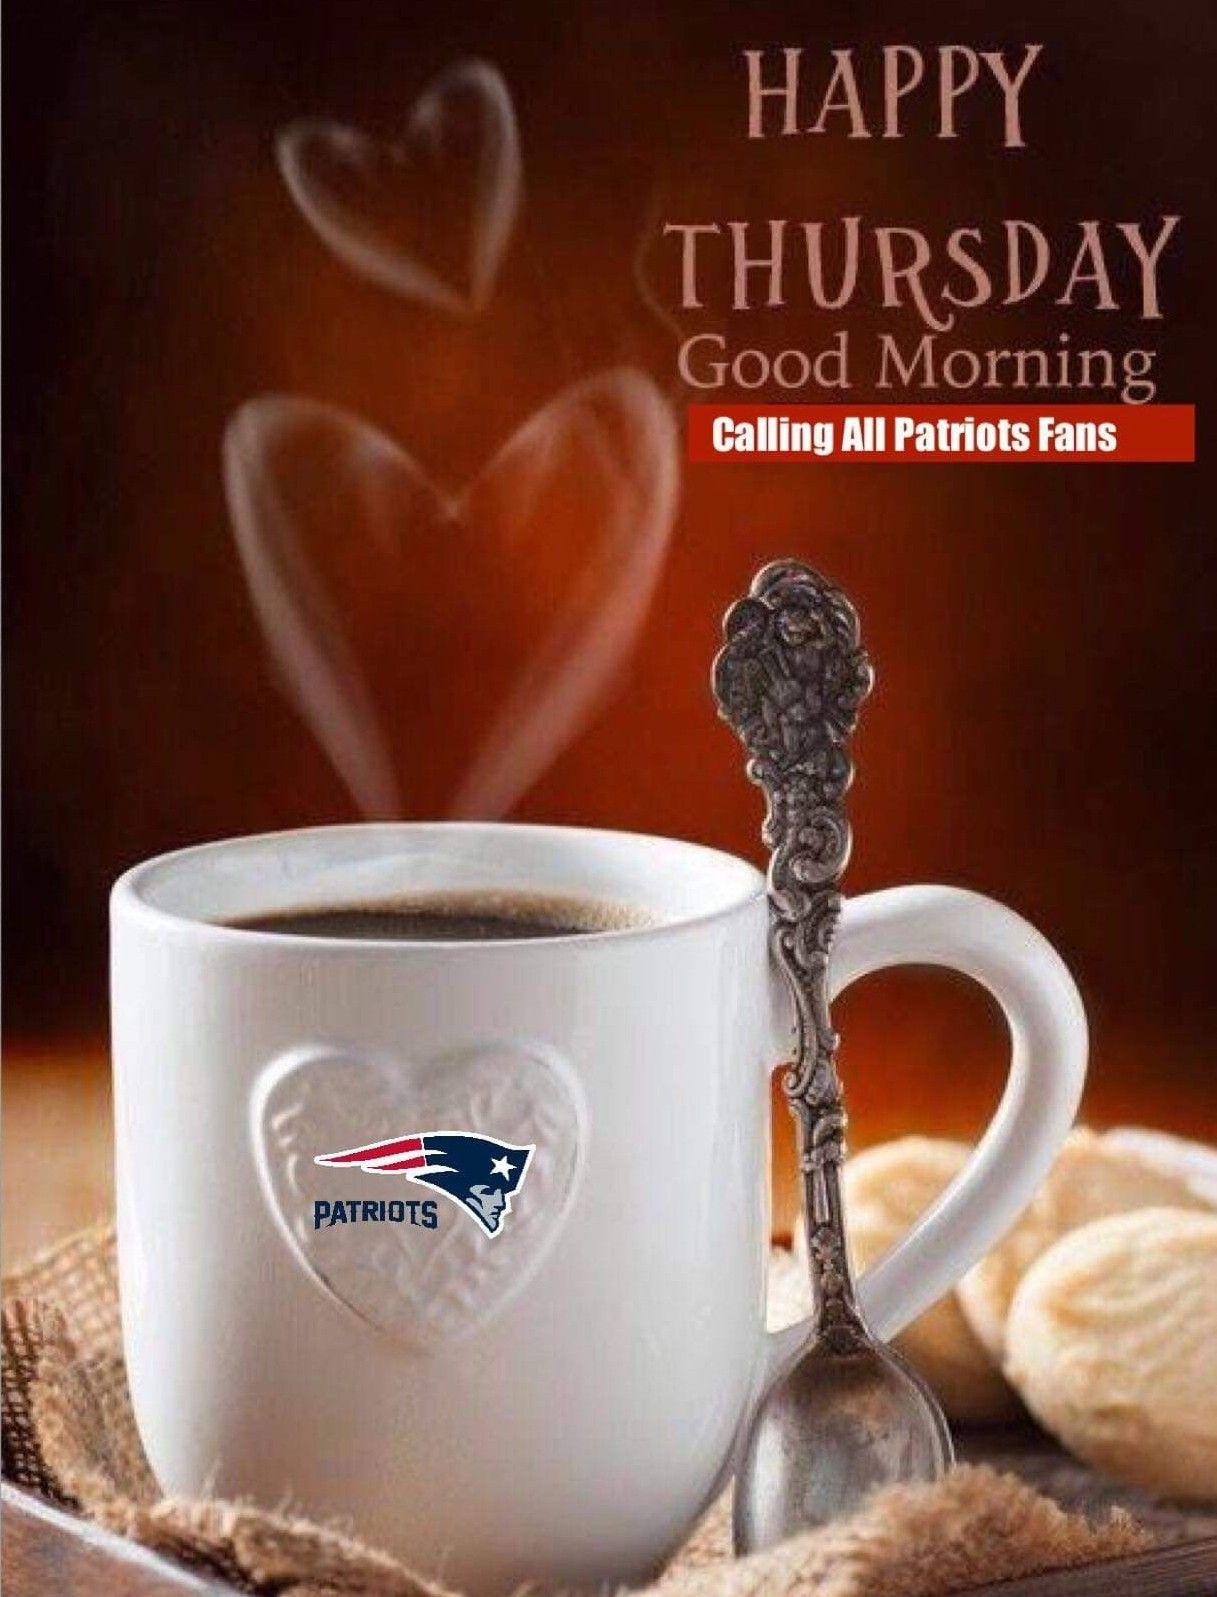 Pin By Riccardo C On Patriots Good Morning Call Patriots Fans Patriots Memes